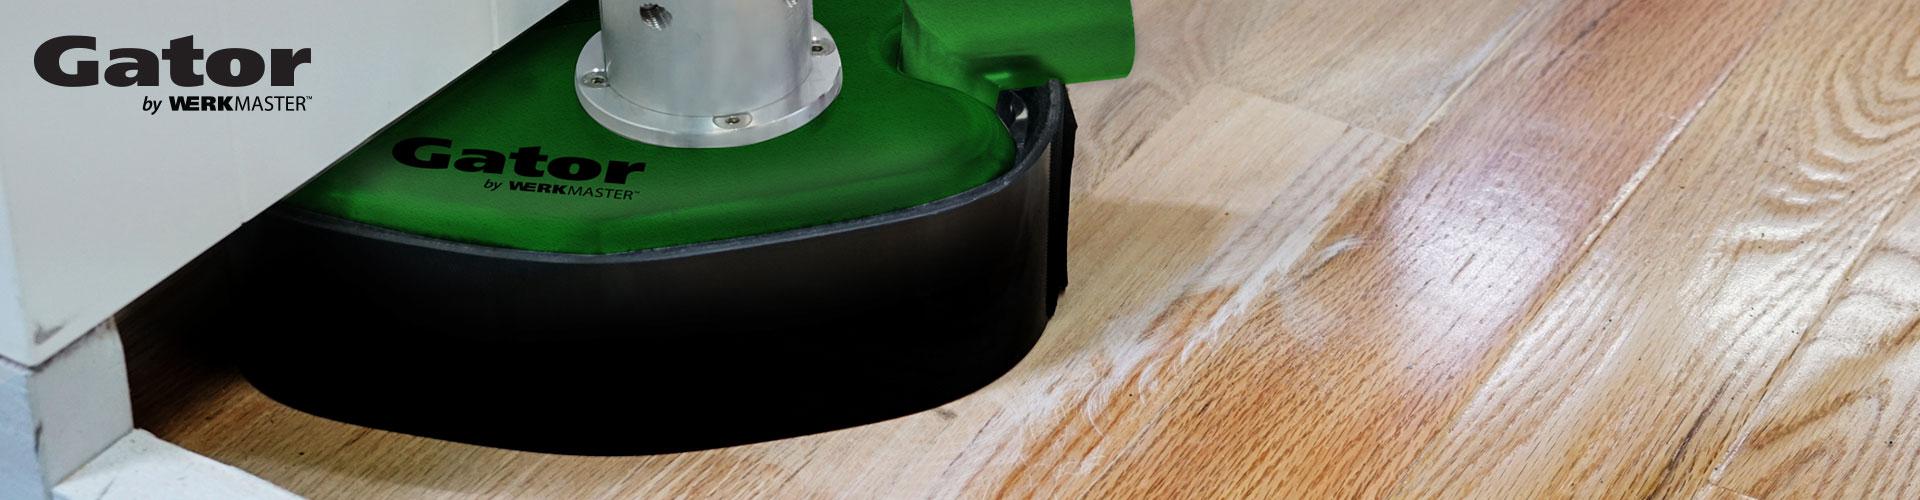 Gator Handheld hardwood floor sander